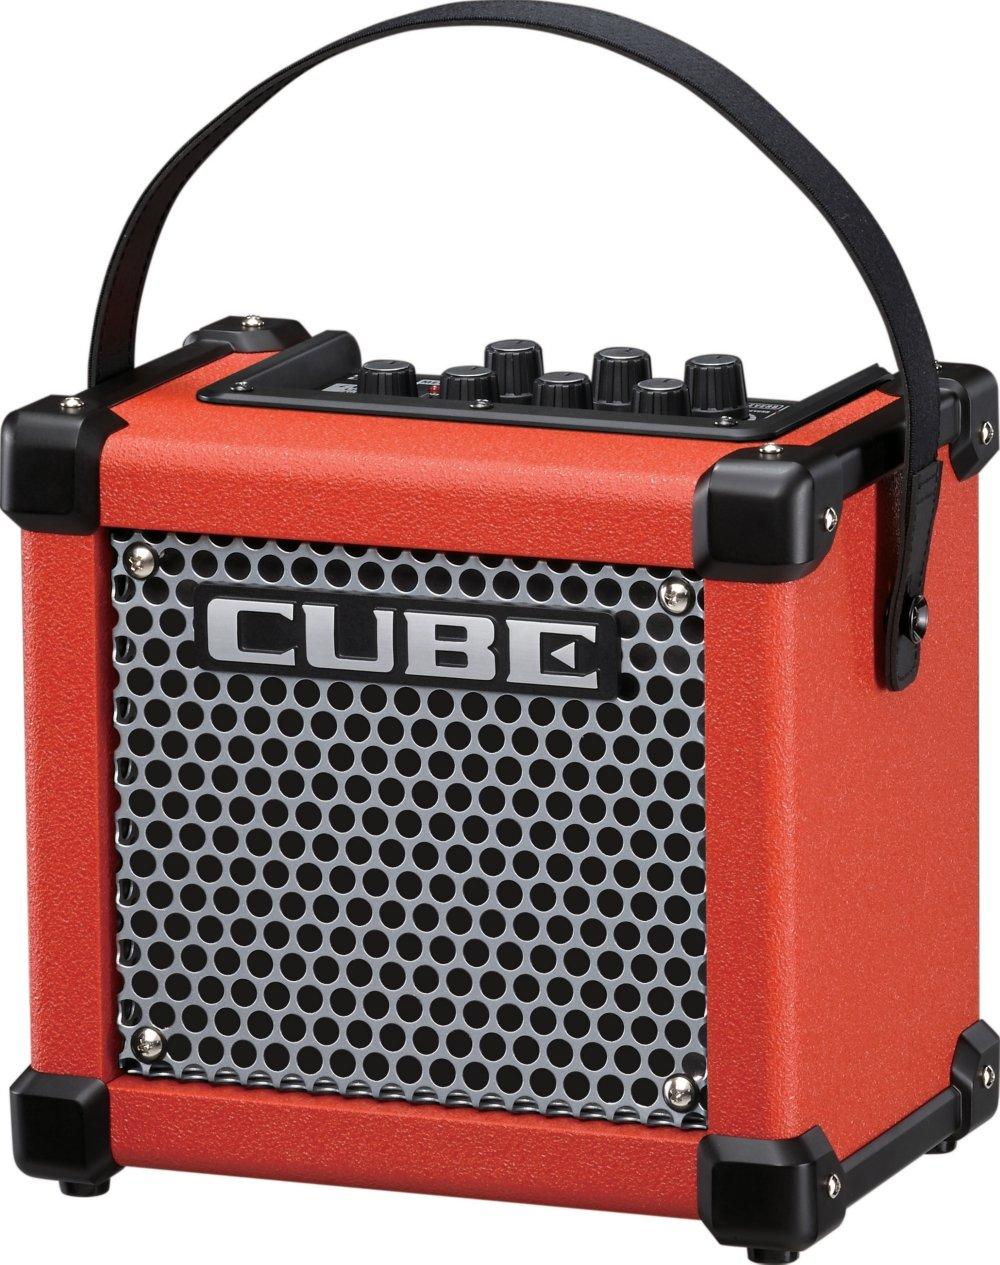 Roland Micro Cube GX - Slightly High-End Guitar Amp